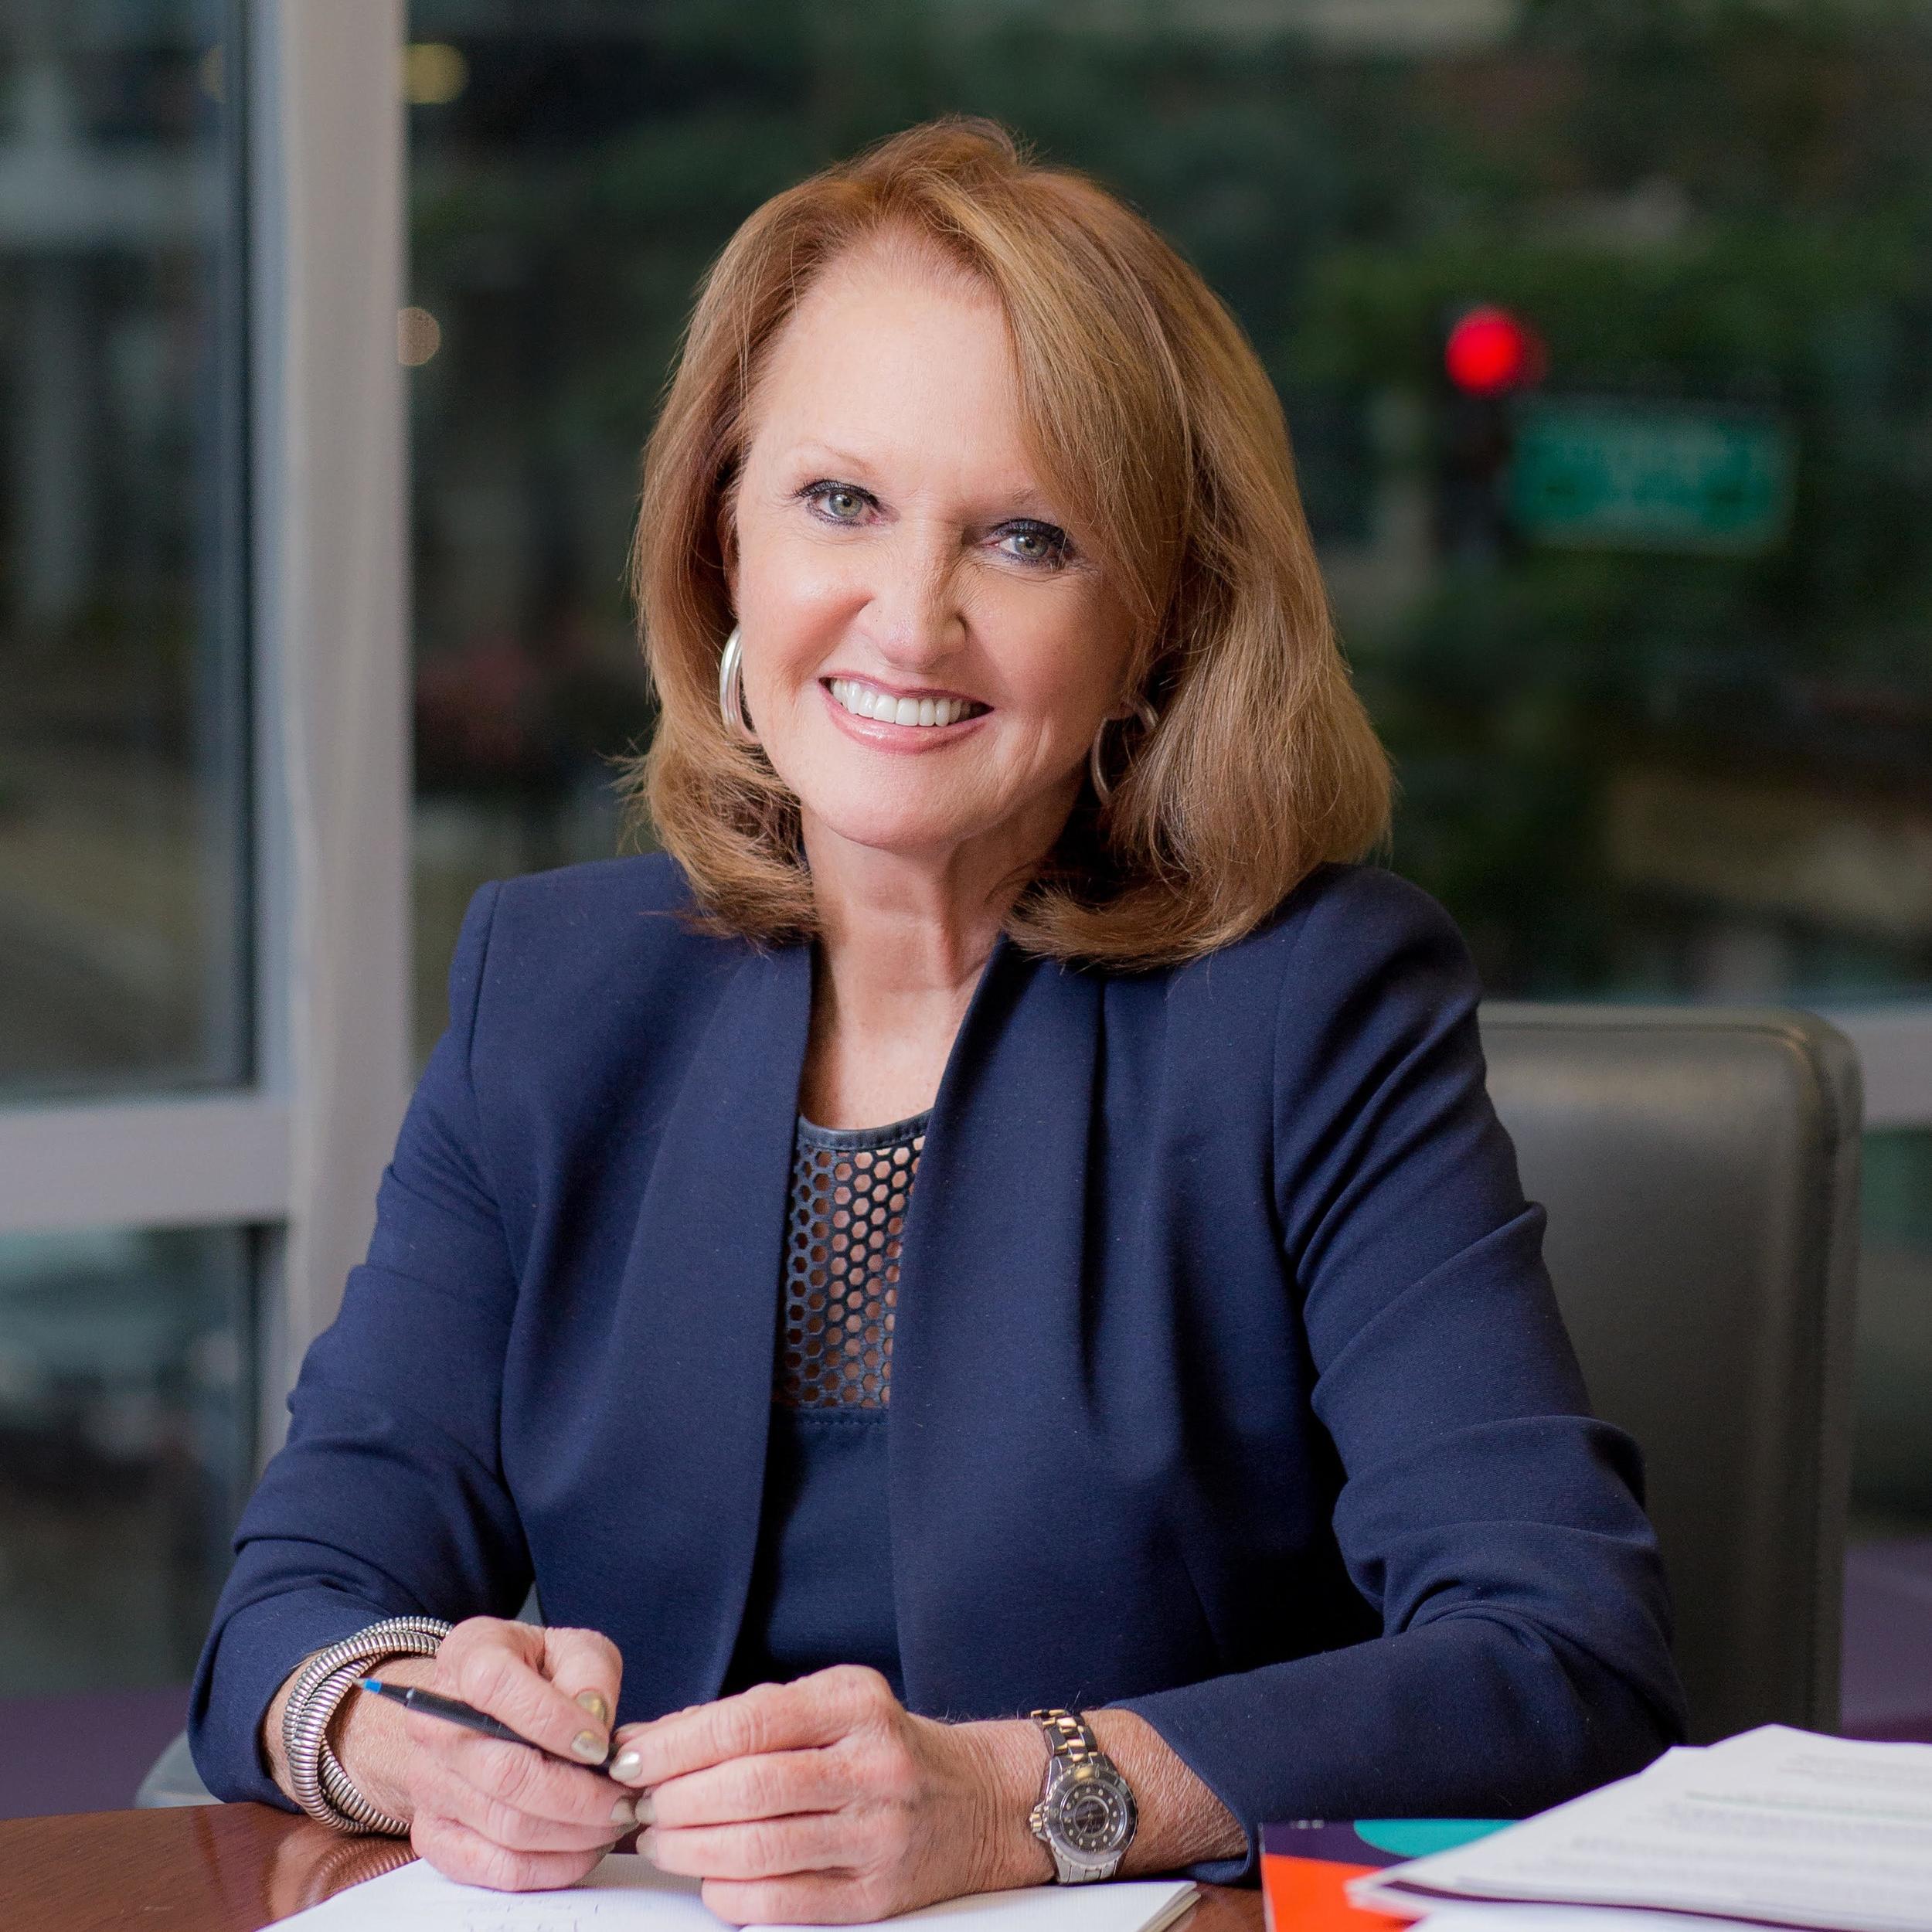 Vicki Escarra - Senior Advisor, The Boston Consulting Group